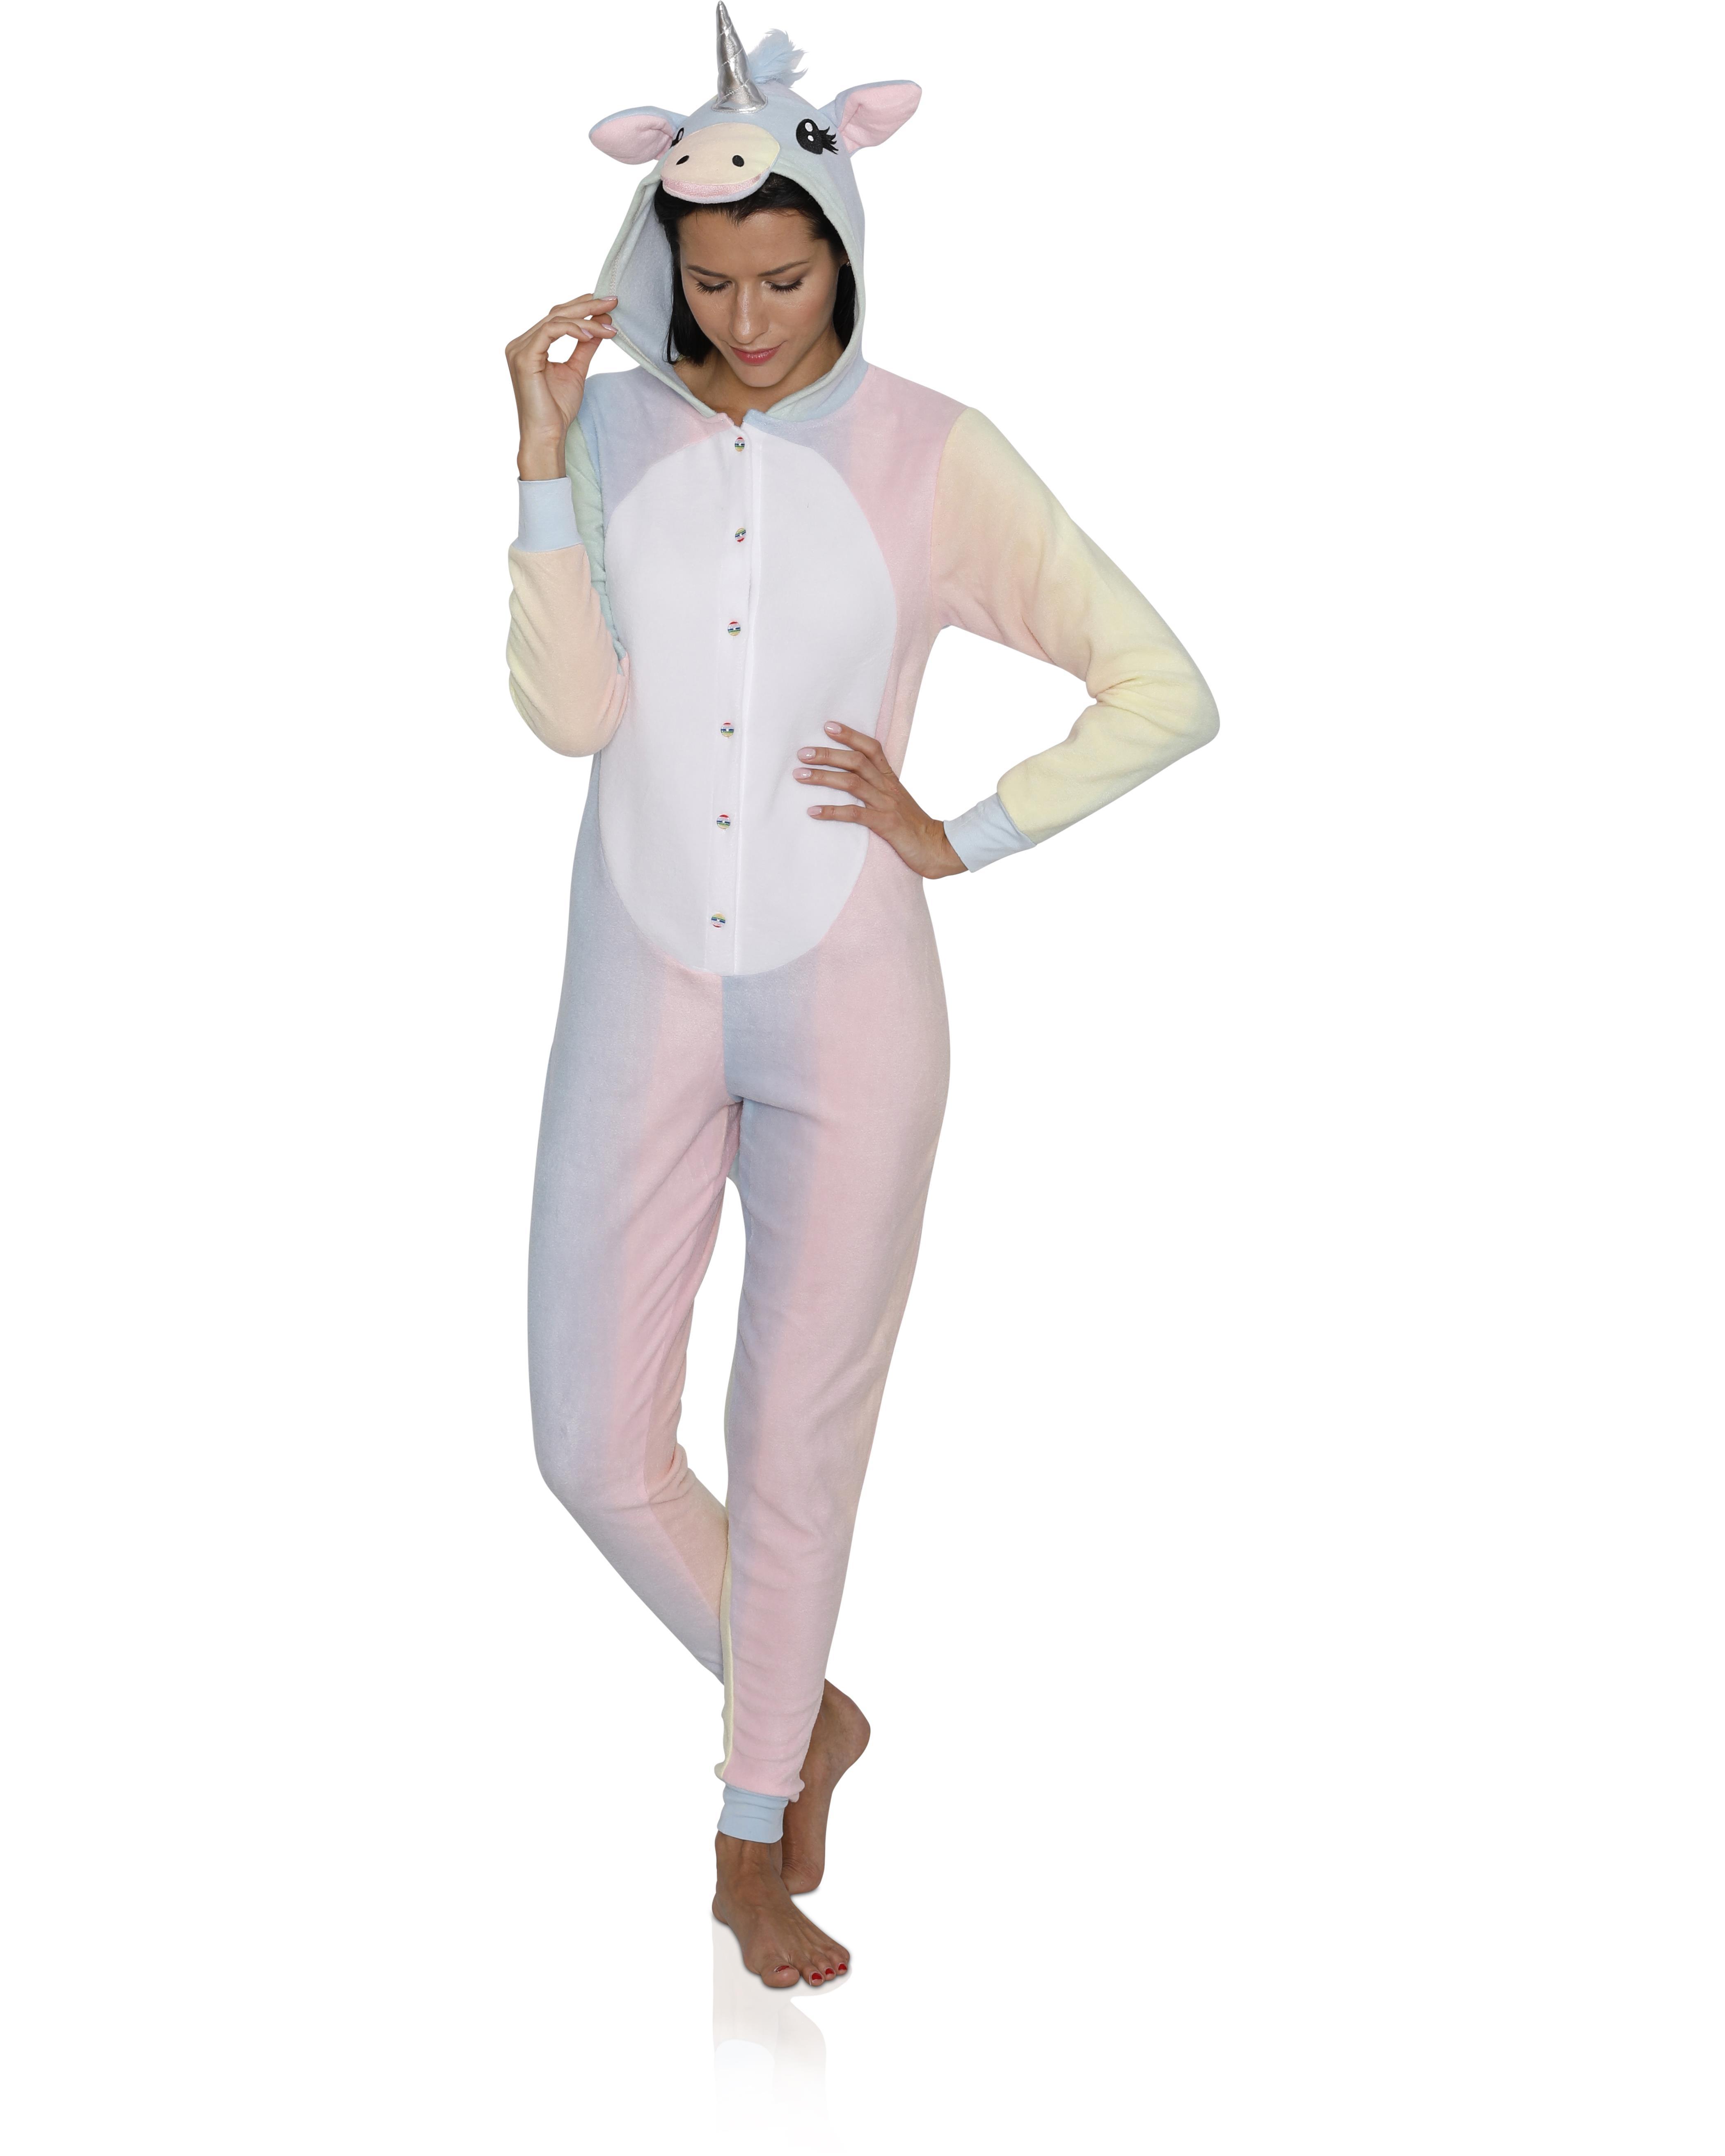 Animal Women's Adult Onesie Pajama Costume Cosplay, Unicorn, Size: M